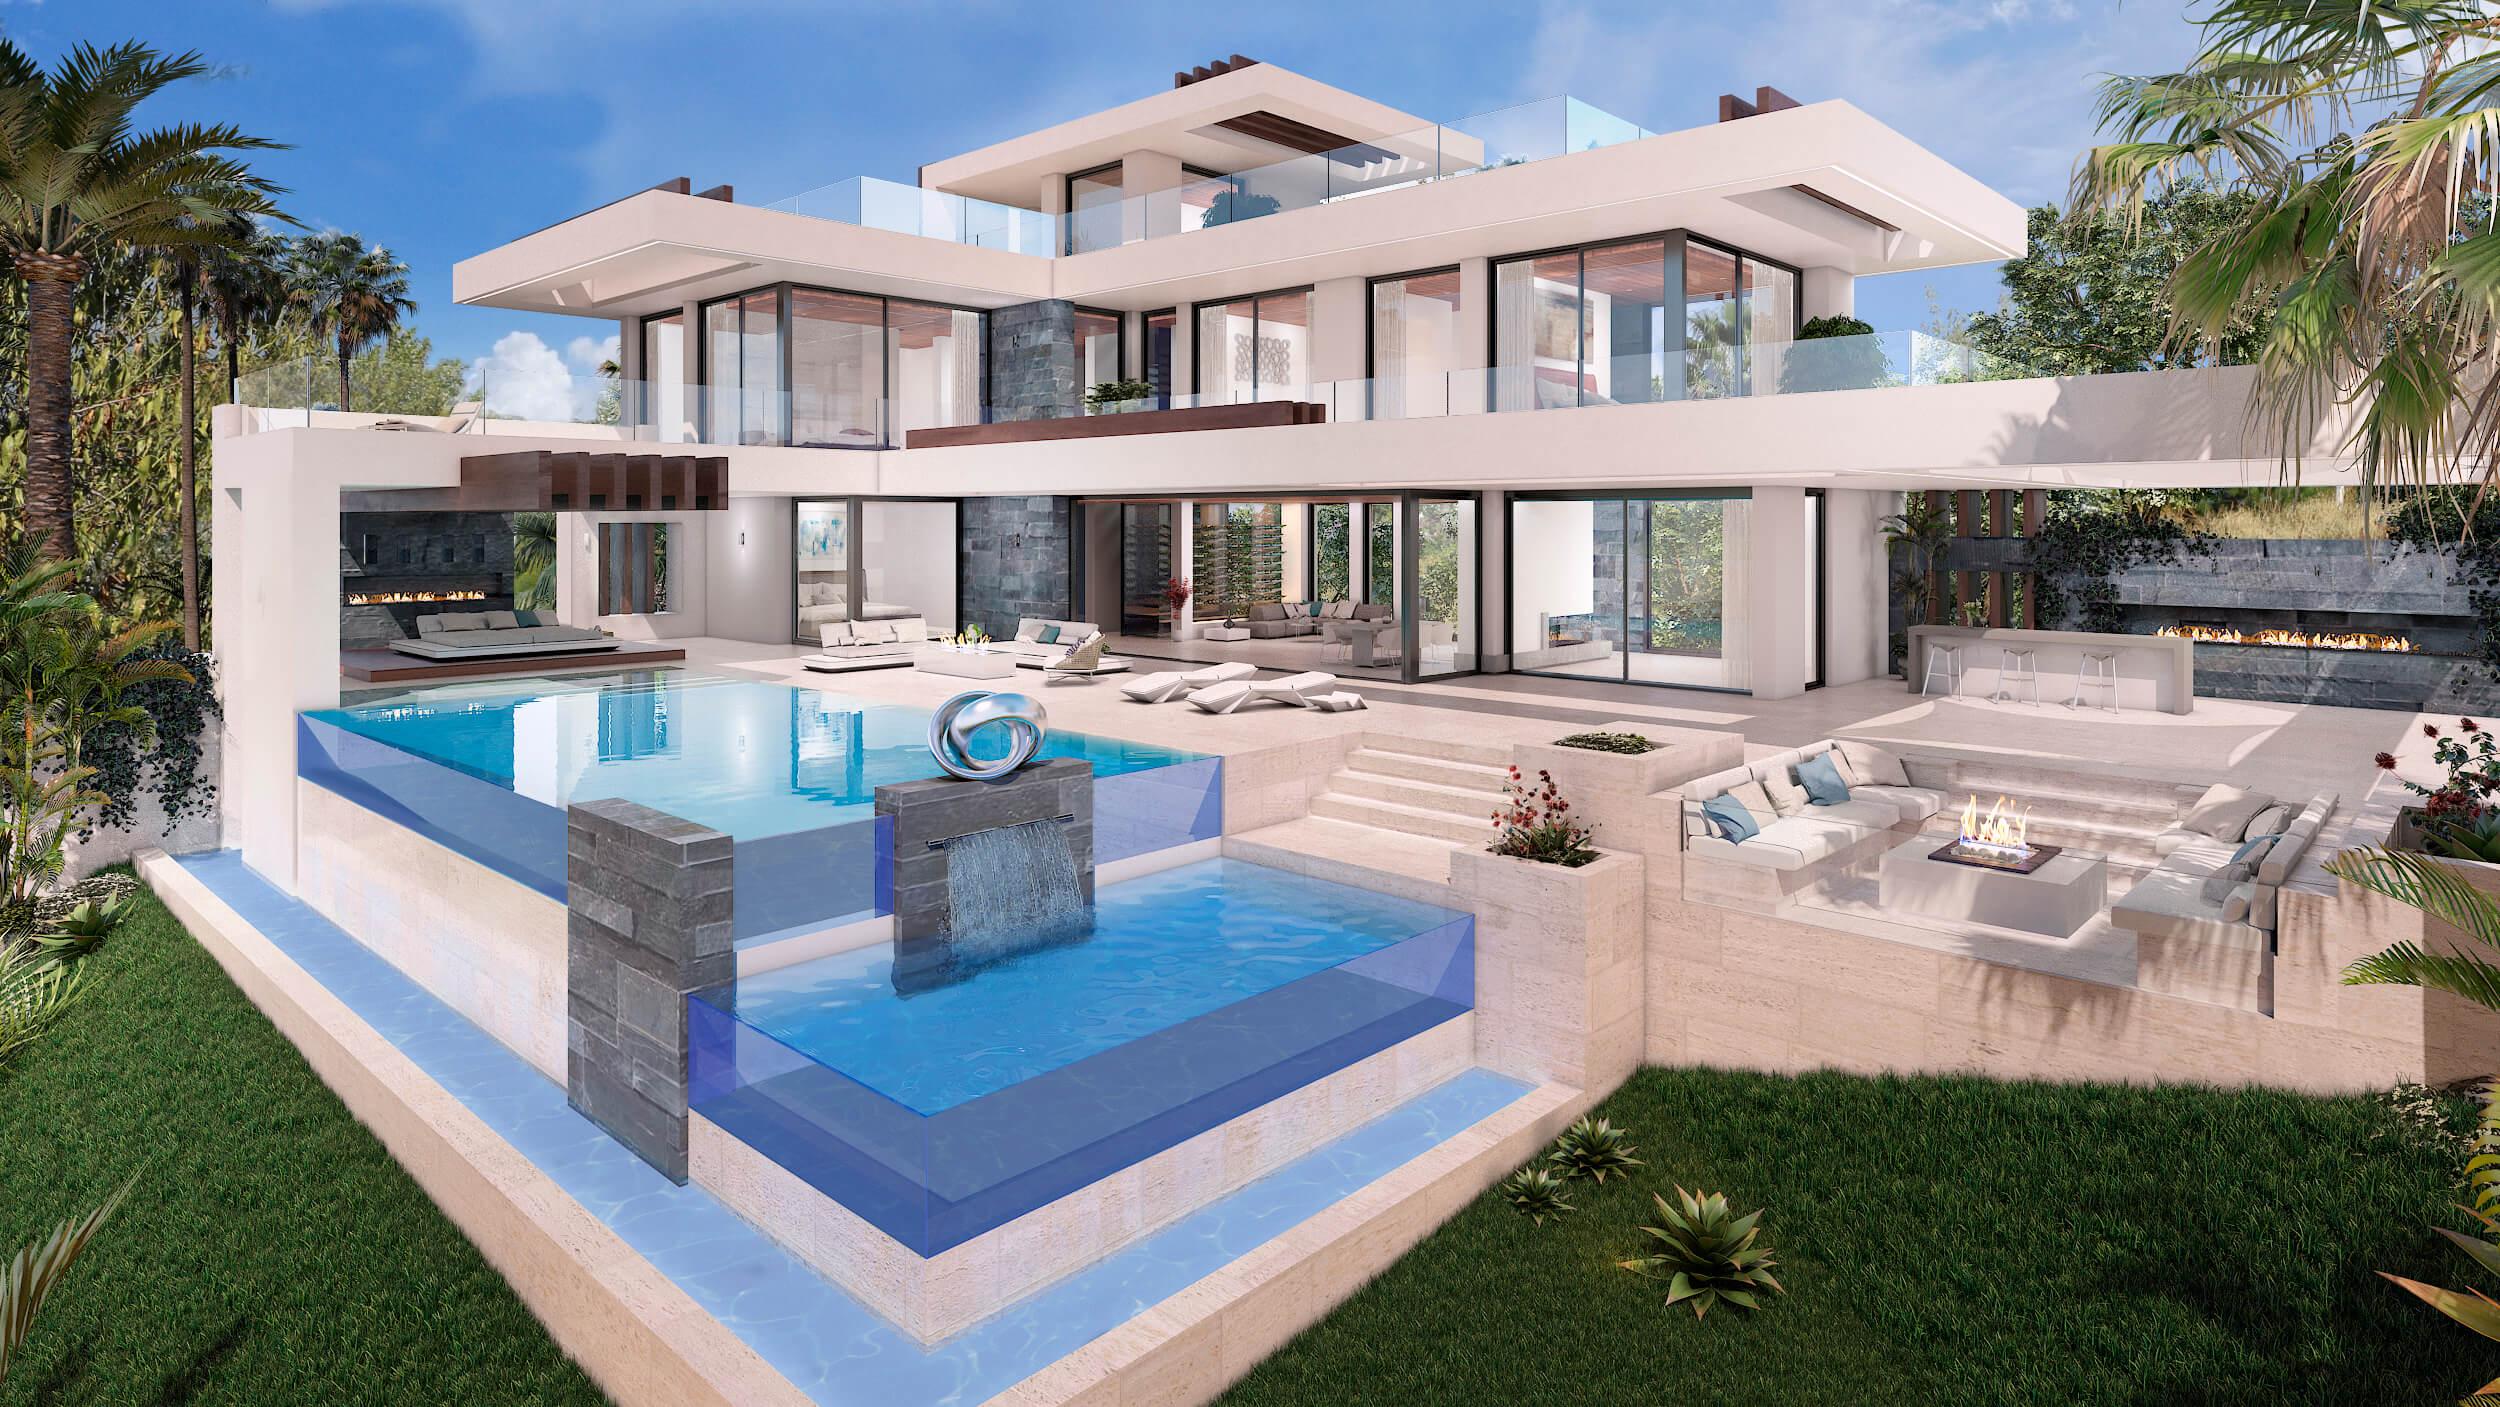 la alqueria benahavis hedendaagse villa kopen zwembad